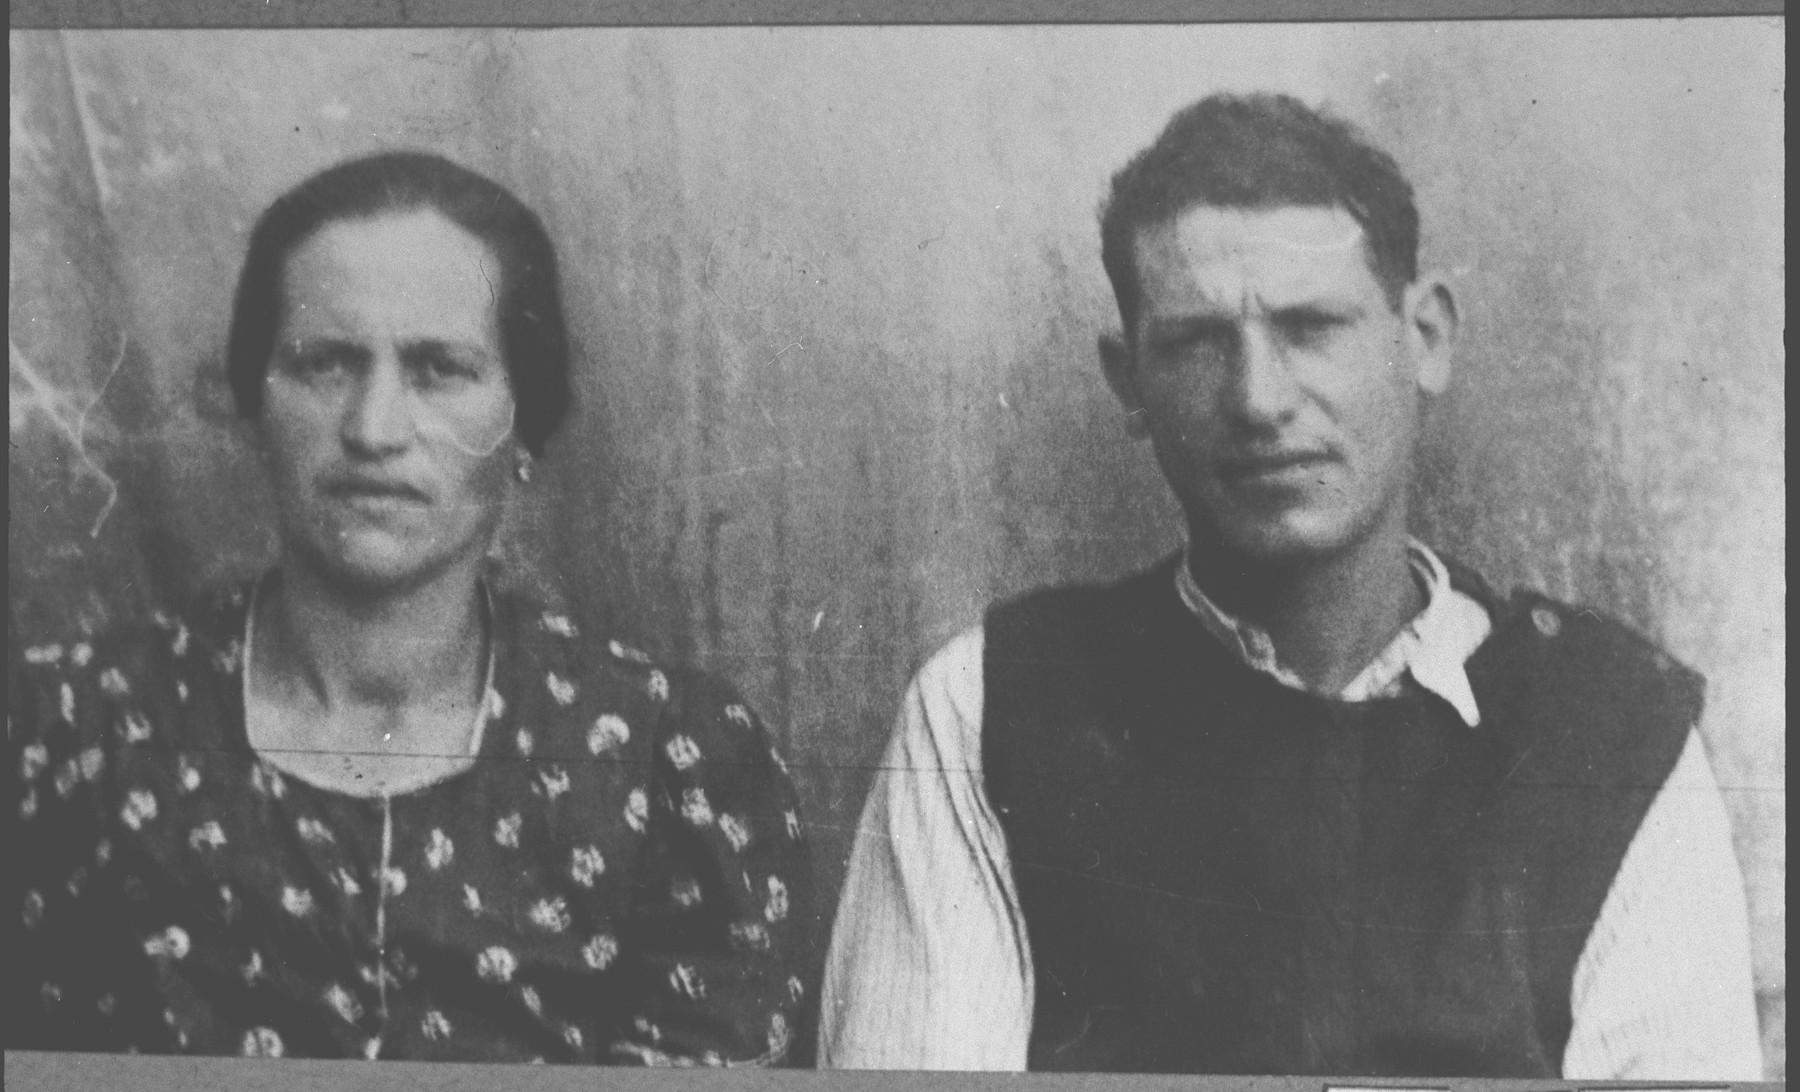 Portrait of Masliach Eschkenasi, son of Isak Eschkenasi, and his wife, Raschel.